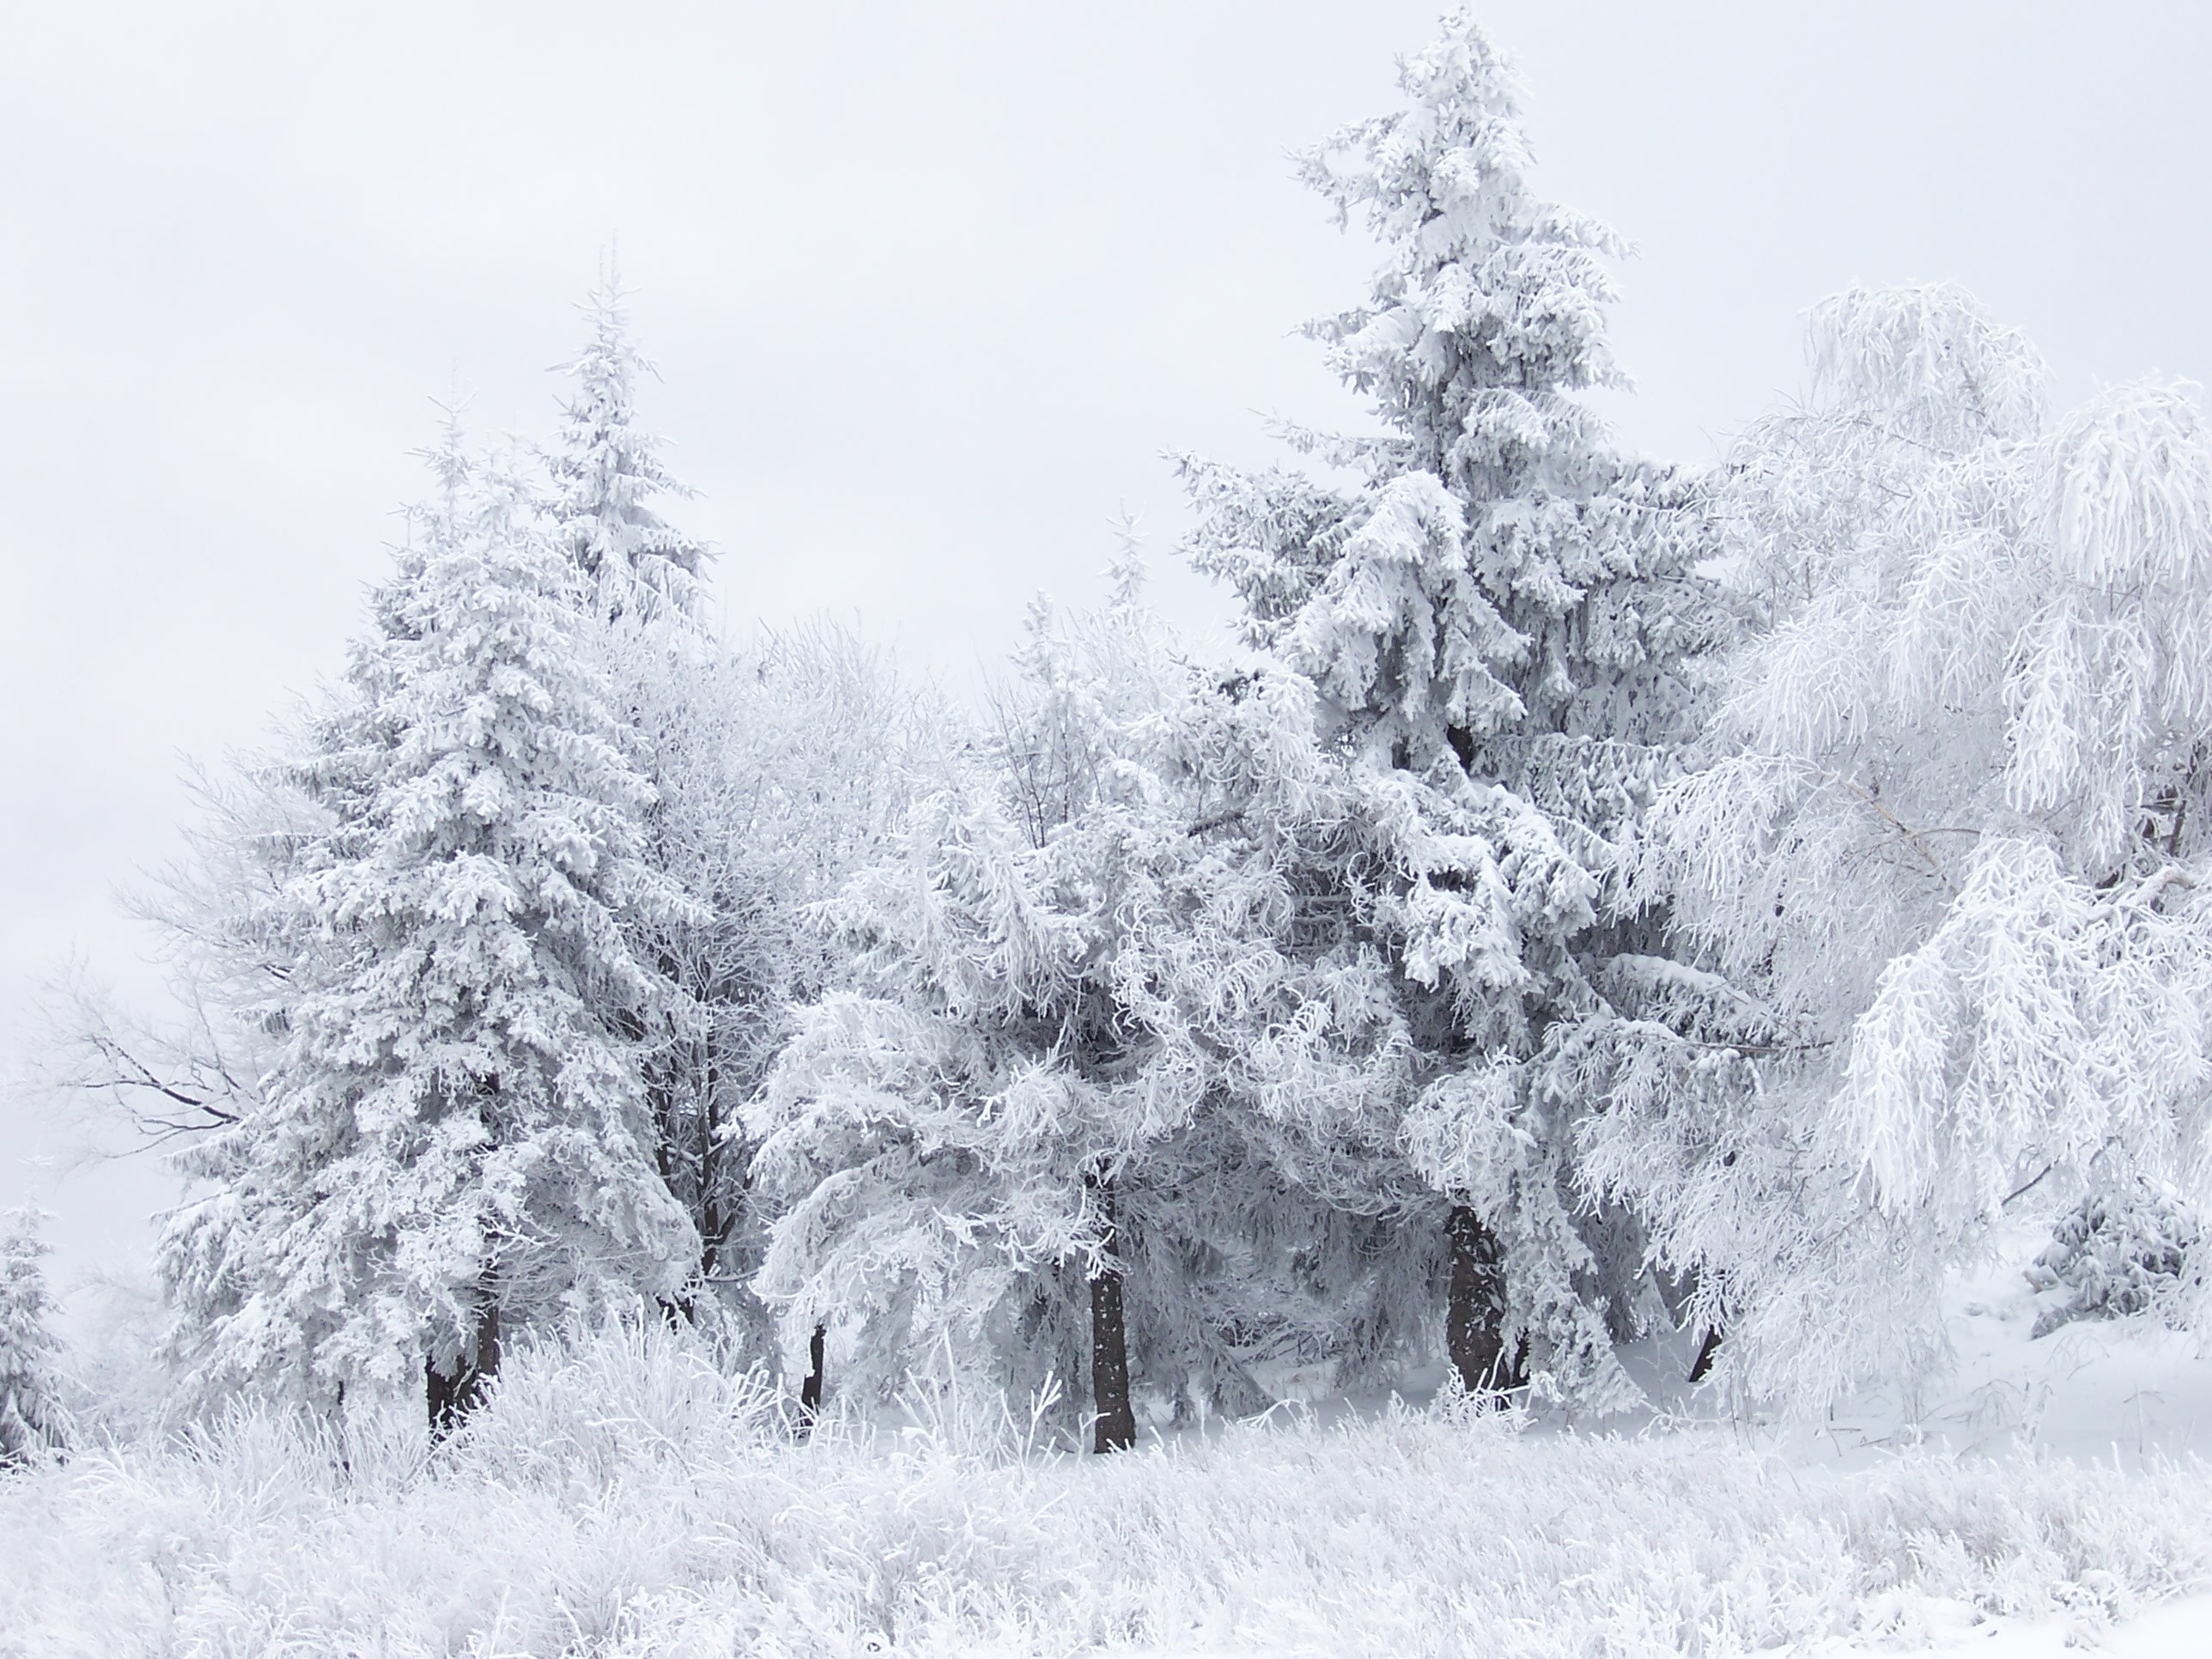 15 best let it snow images on Pinterest   Snow scenes, Winter scenes and  Winter snow